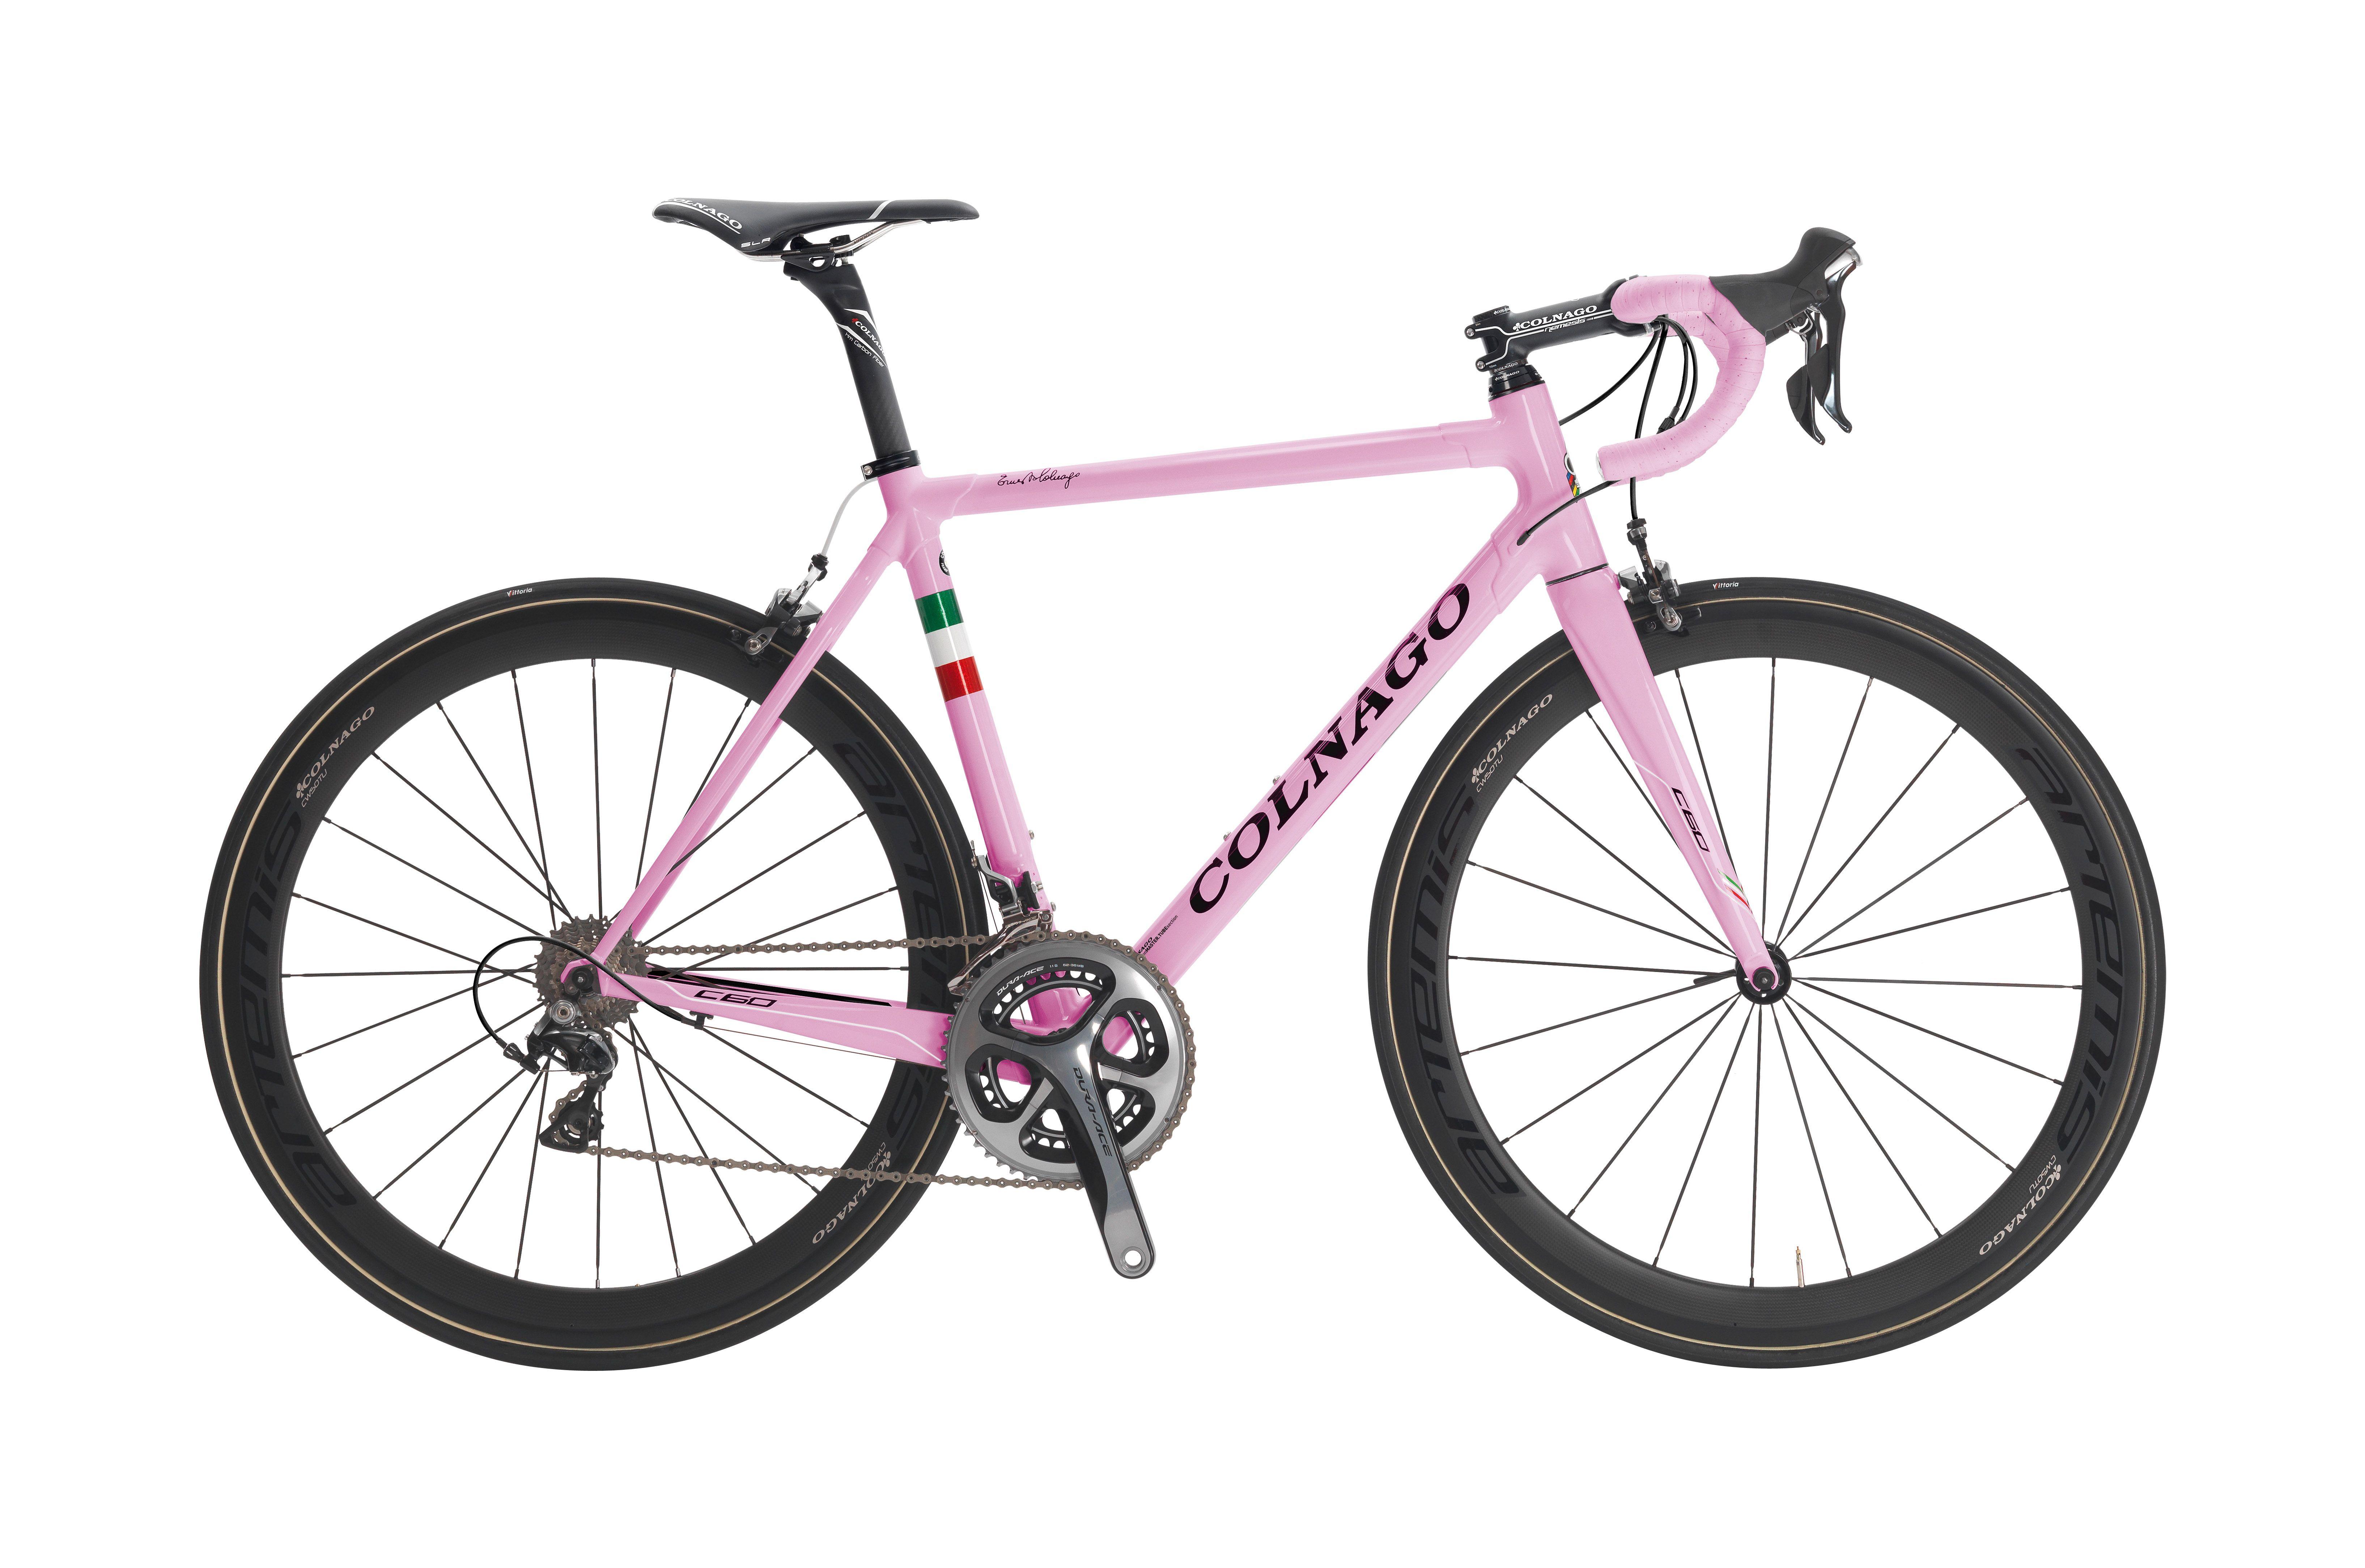 Colnago C60 Italia Pink Bicicletas Bici Ciclismo